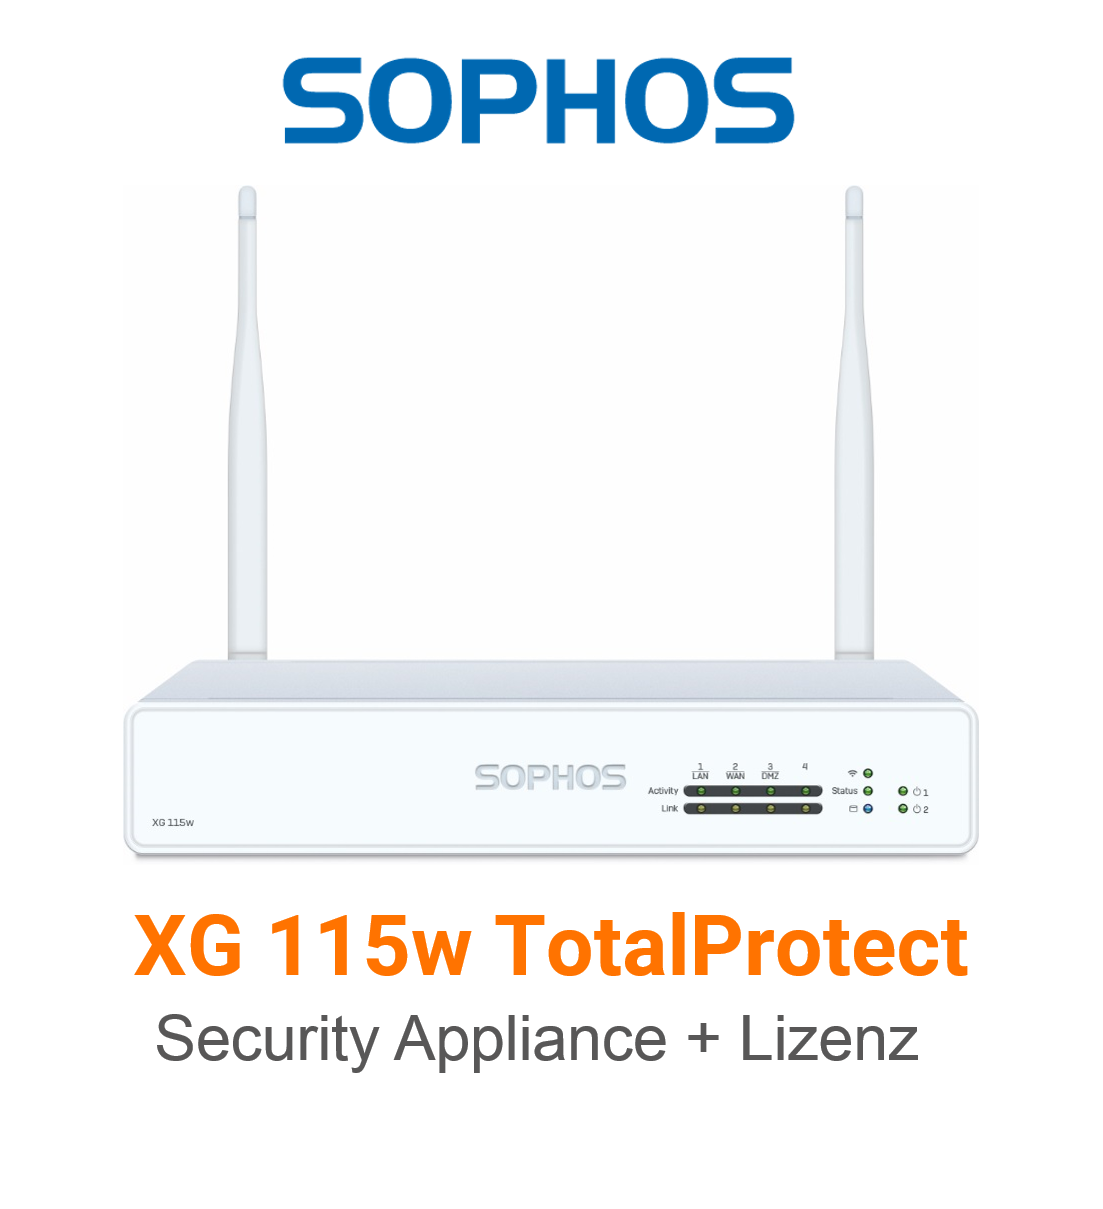 Sophos XG 115w TotalProtect Bundle (Hardware + Lizenz)